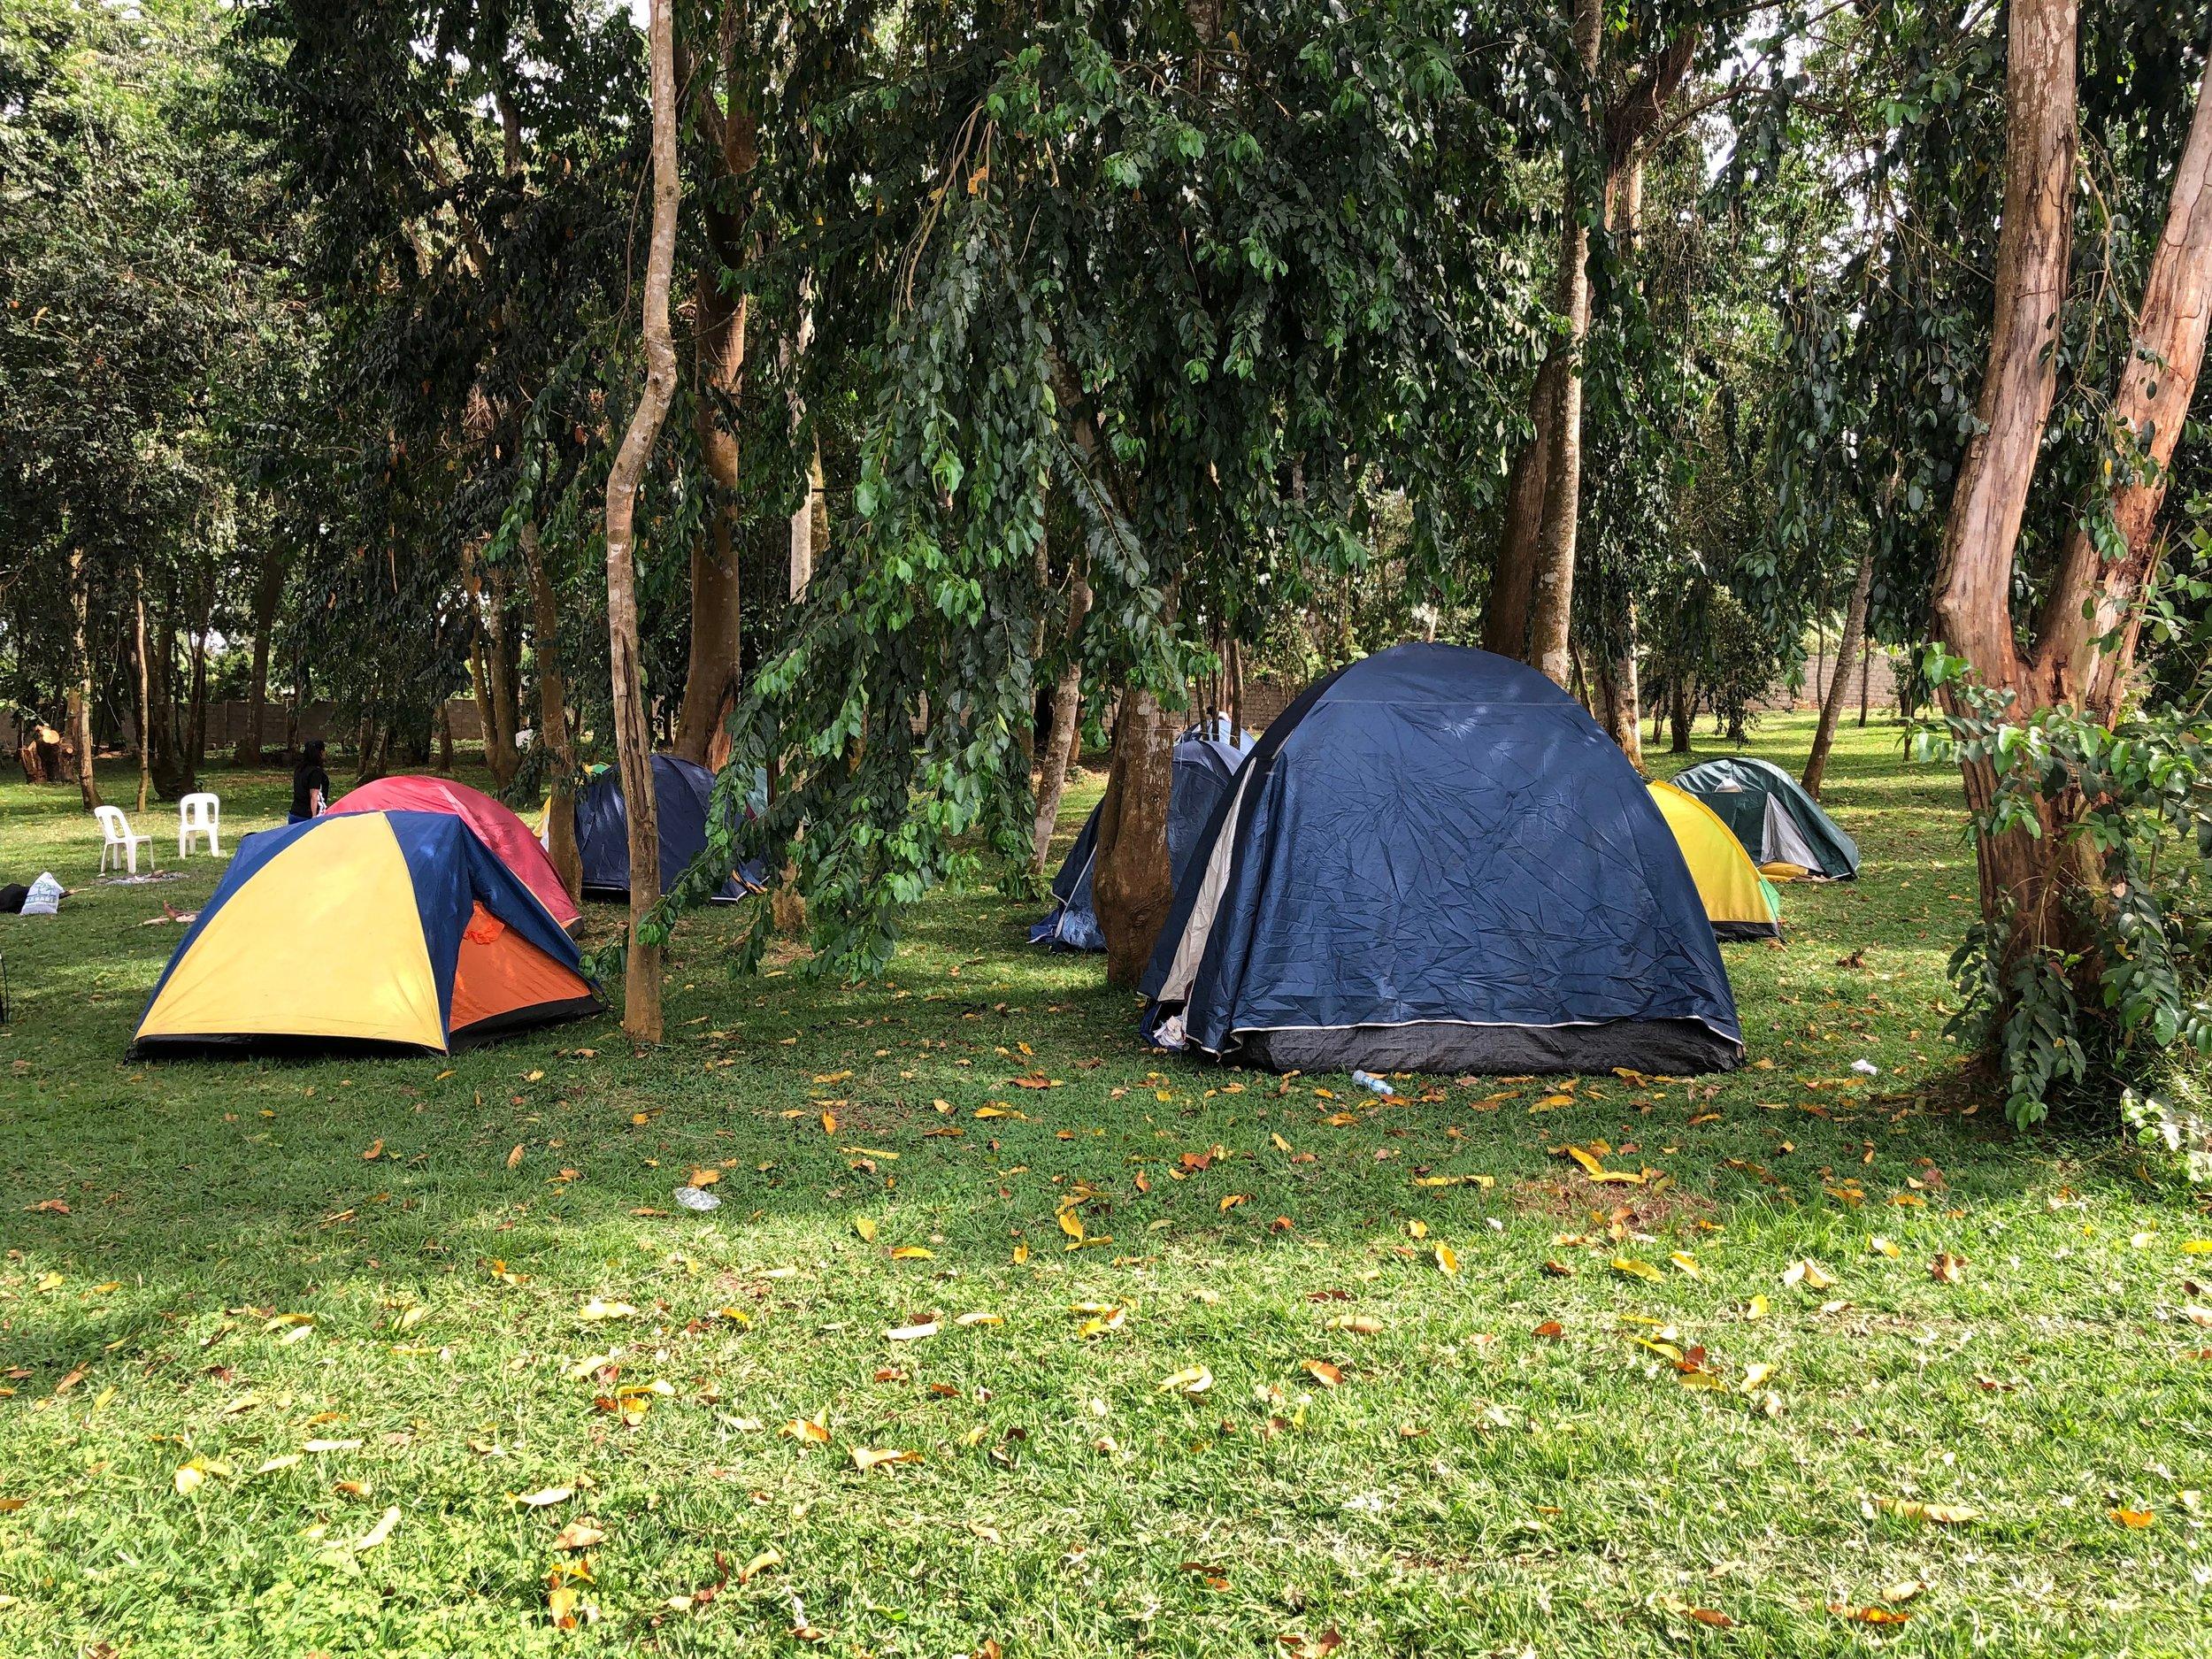 Camp site at Woods Arena